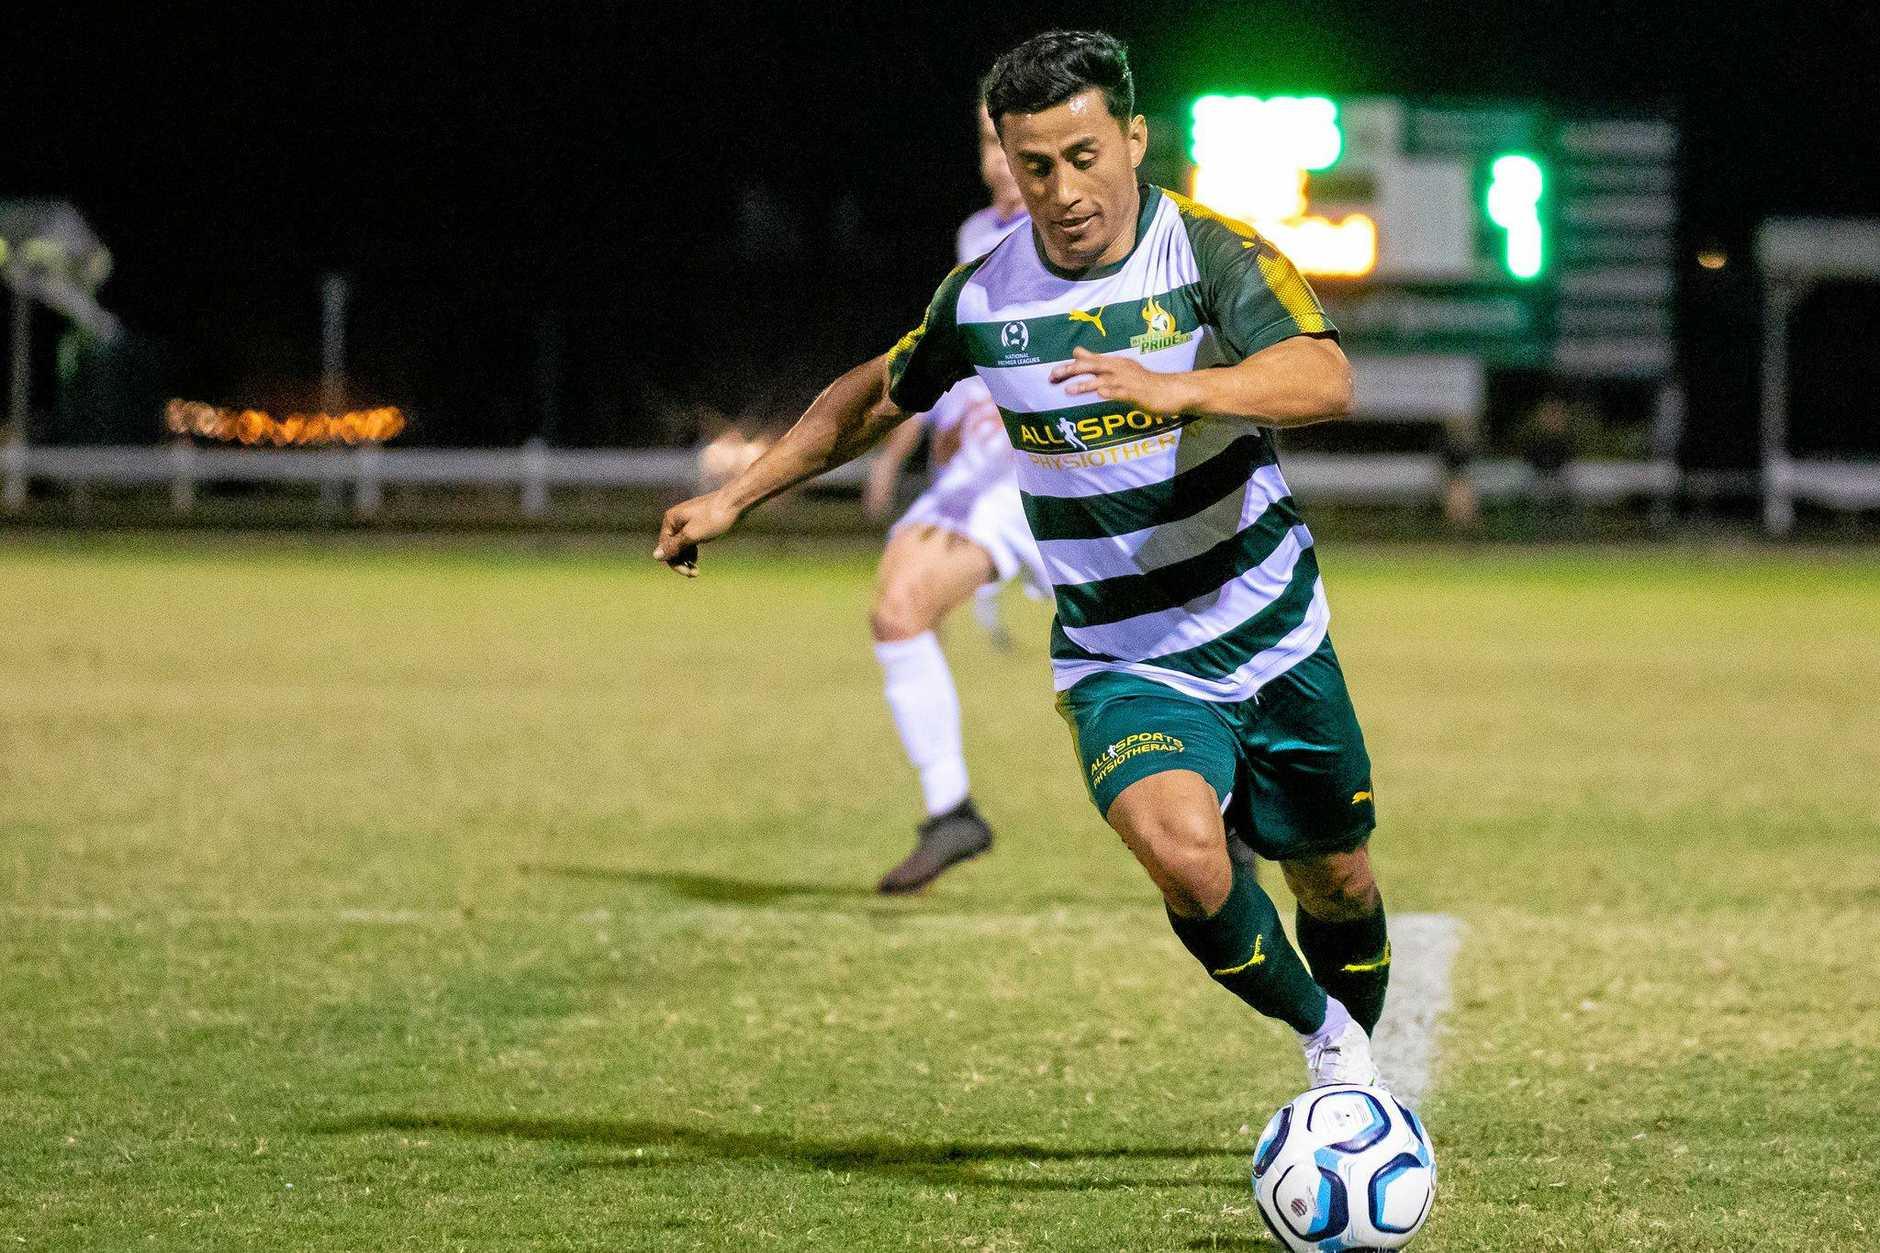 Western Pride midfield/striker Zelfy Nazary averages 11-12km a game on the field.